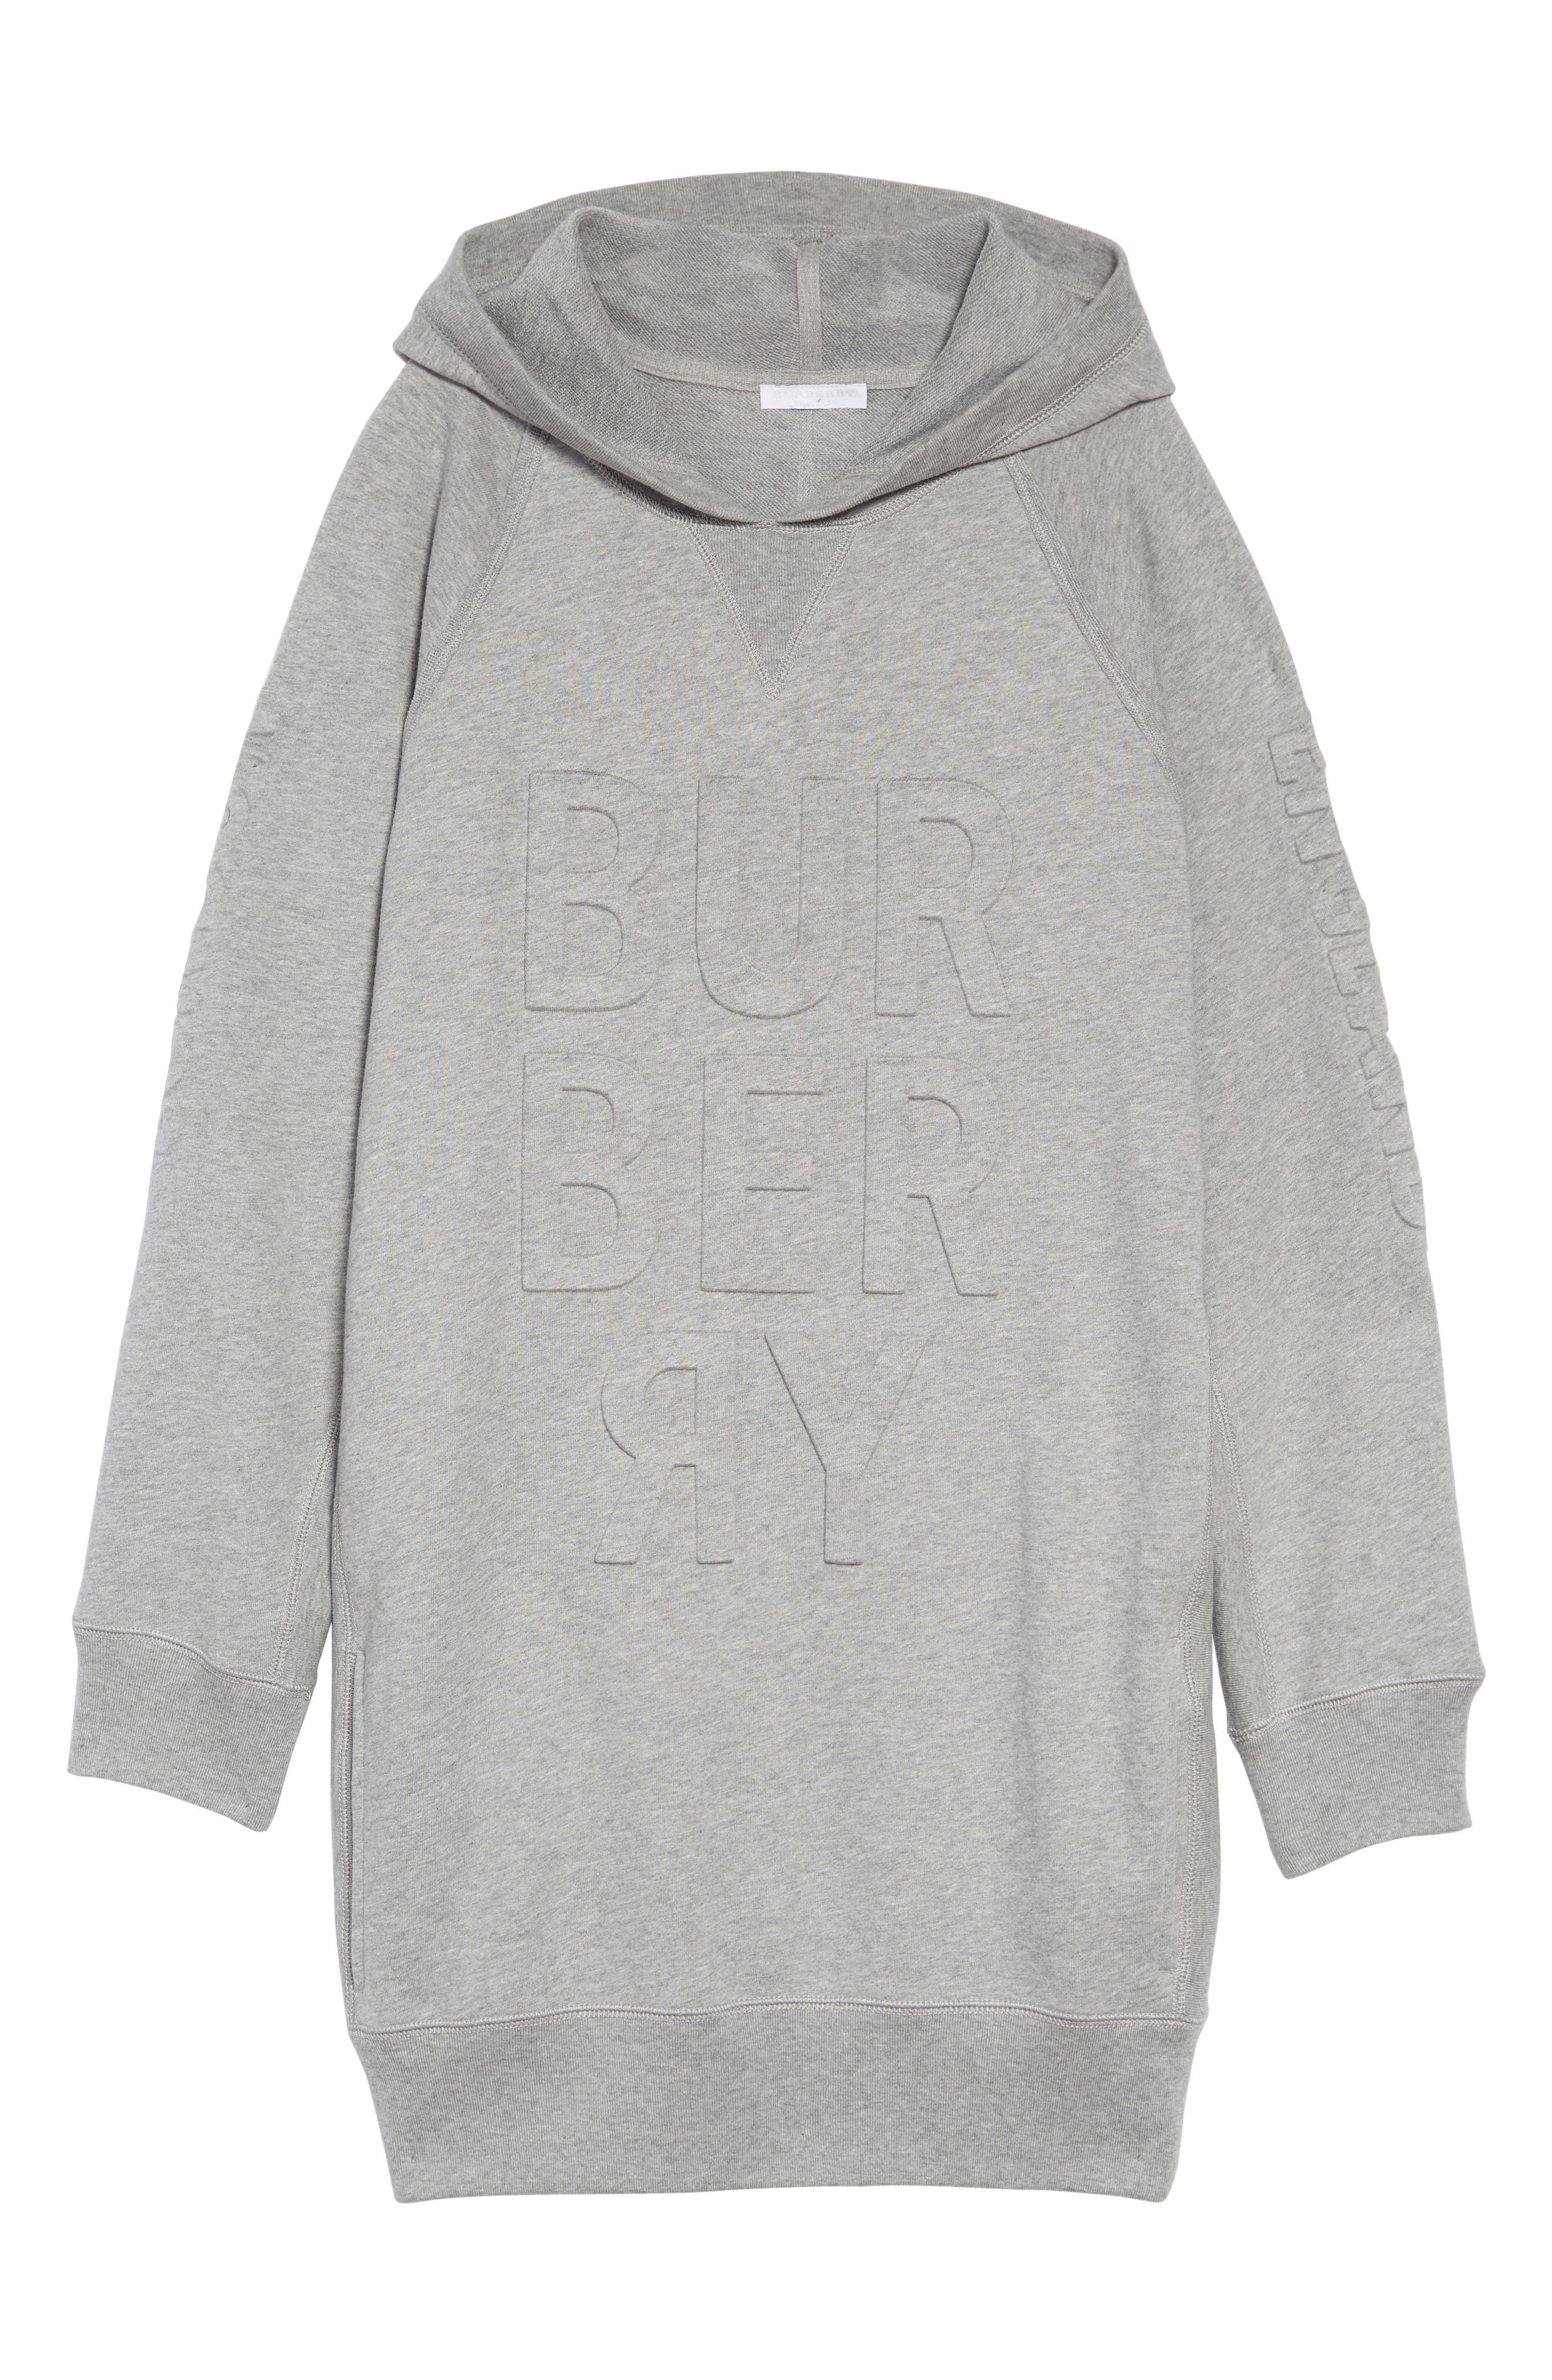 7a7af6140385 Burberry Girls Dresses